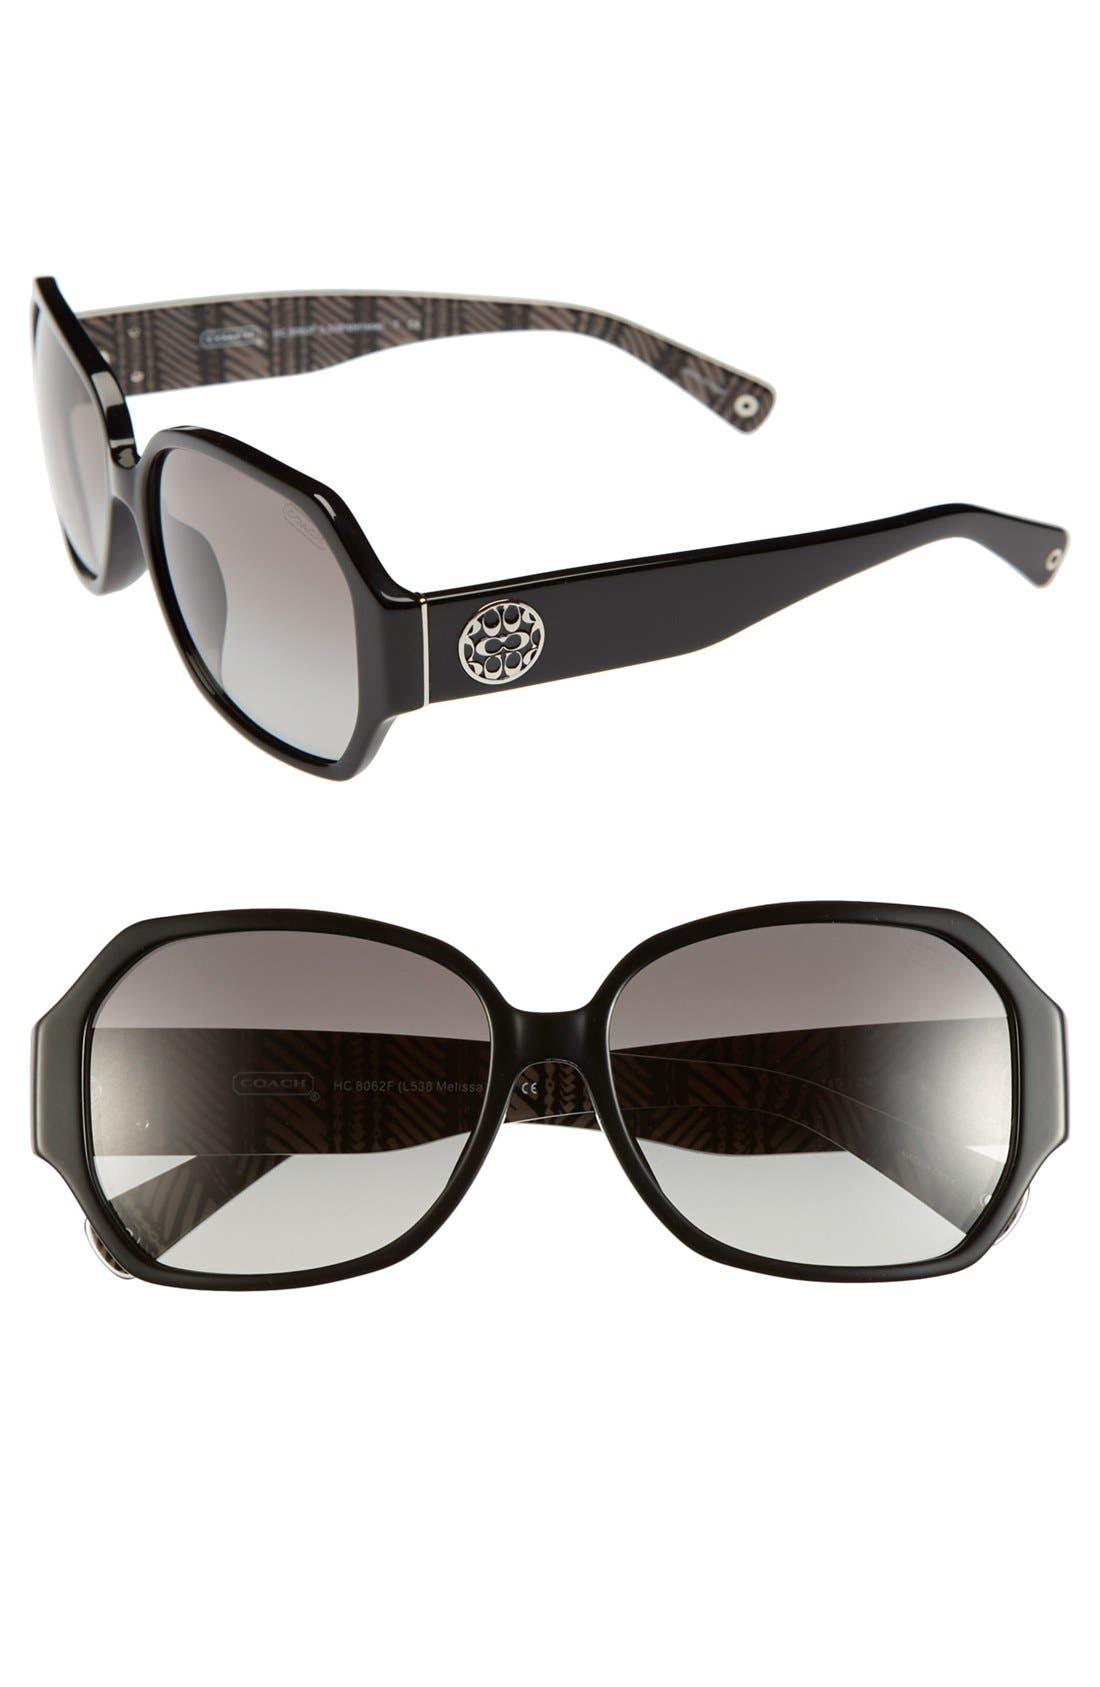 Main Image - COACH 58mm Retro Sunglasses